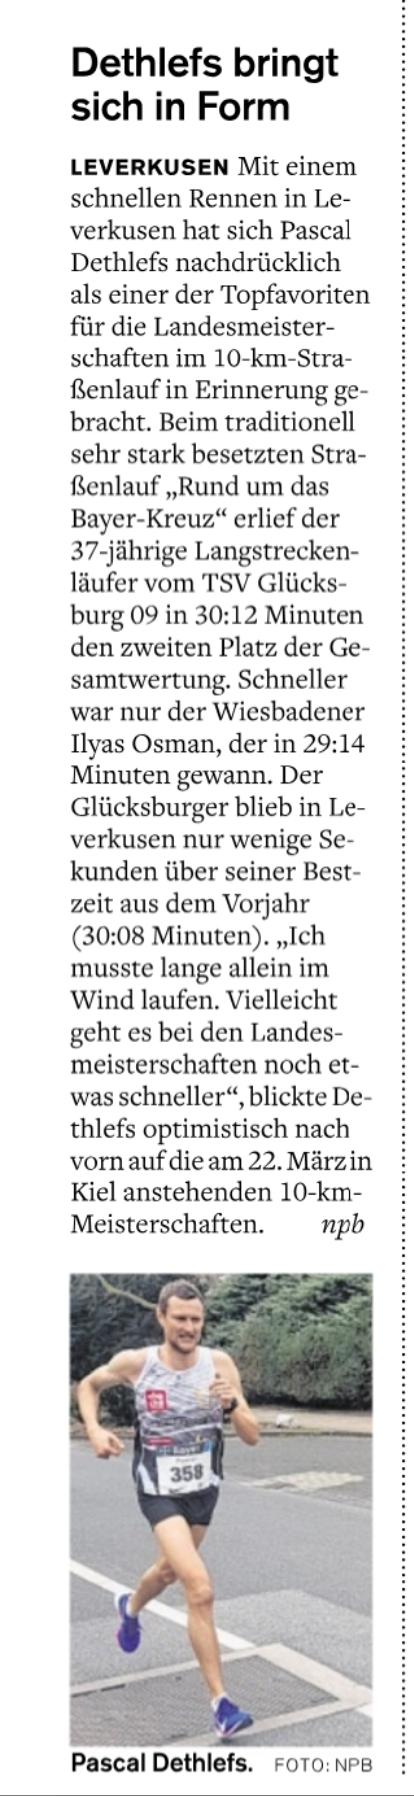 Leverkusen 10km